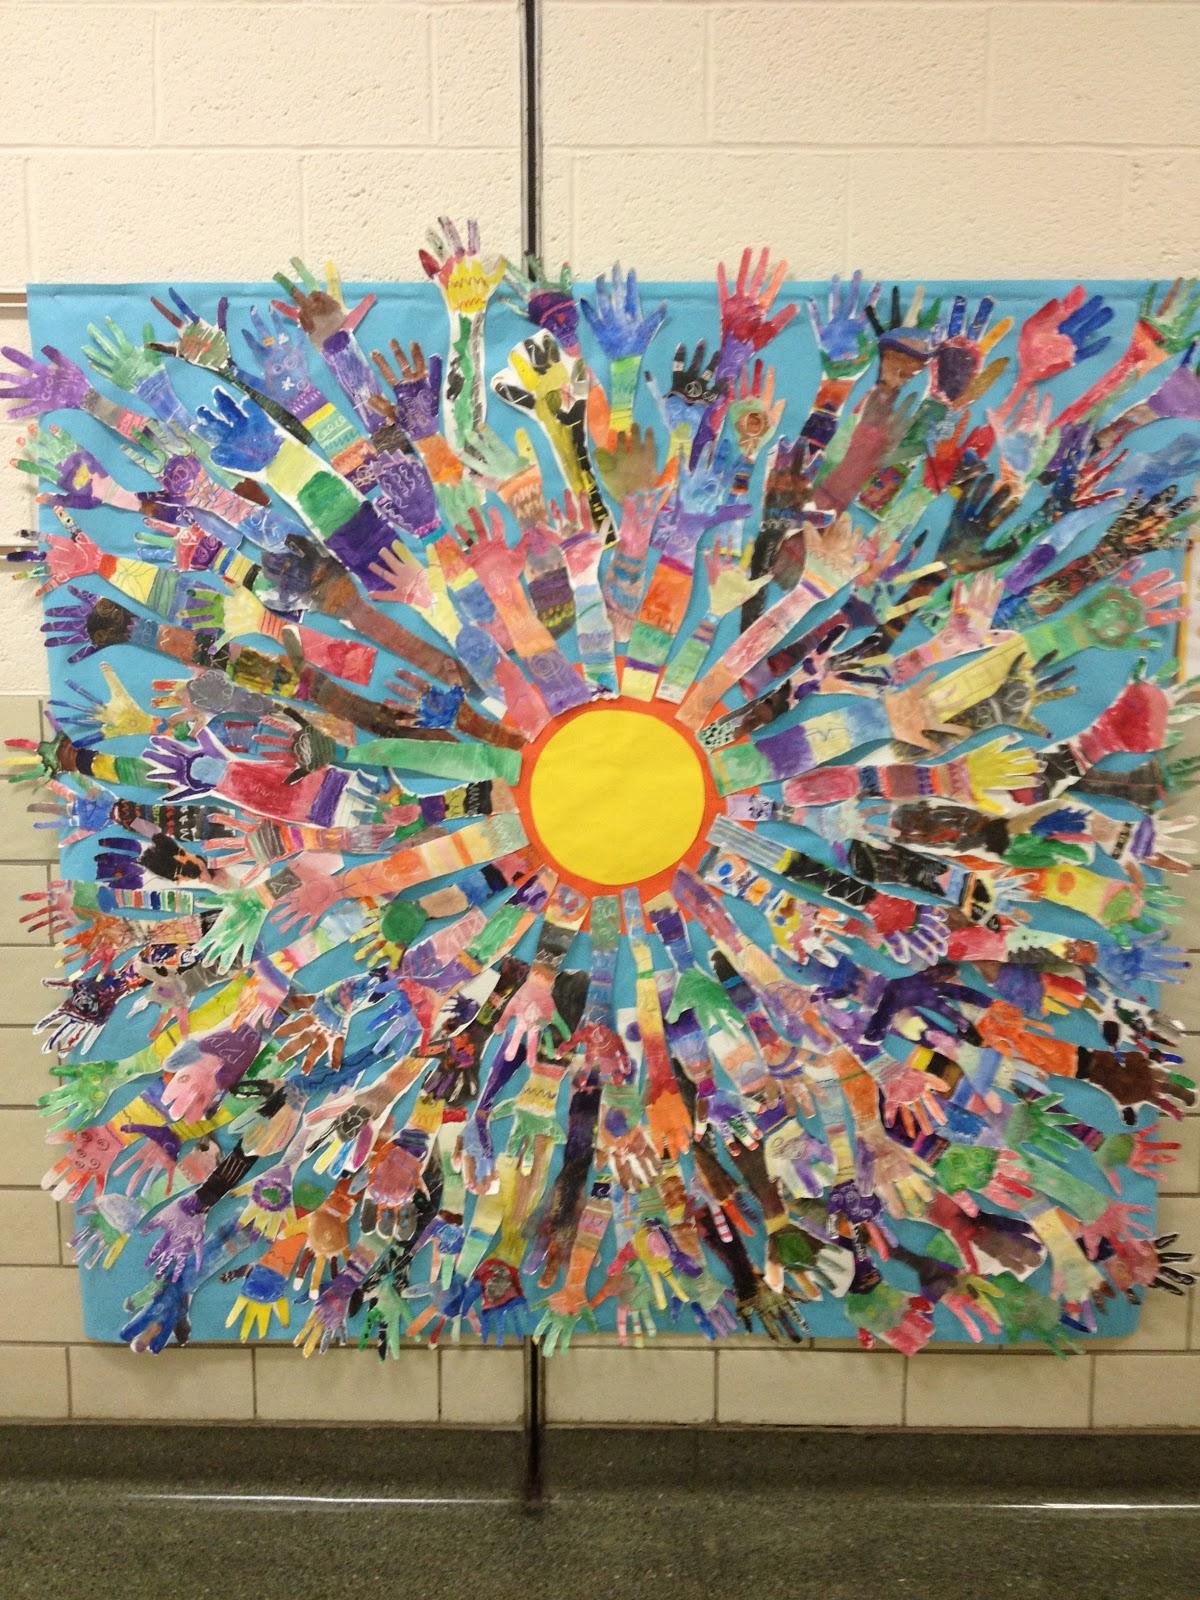 Art Line Quality : Splats scraps and glue blobs hands up for creativity a